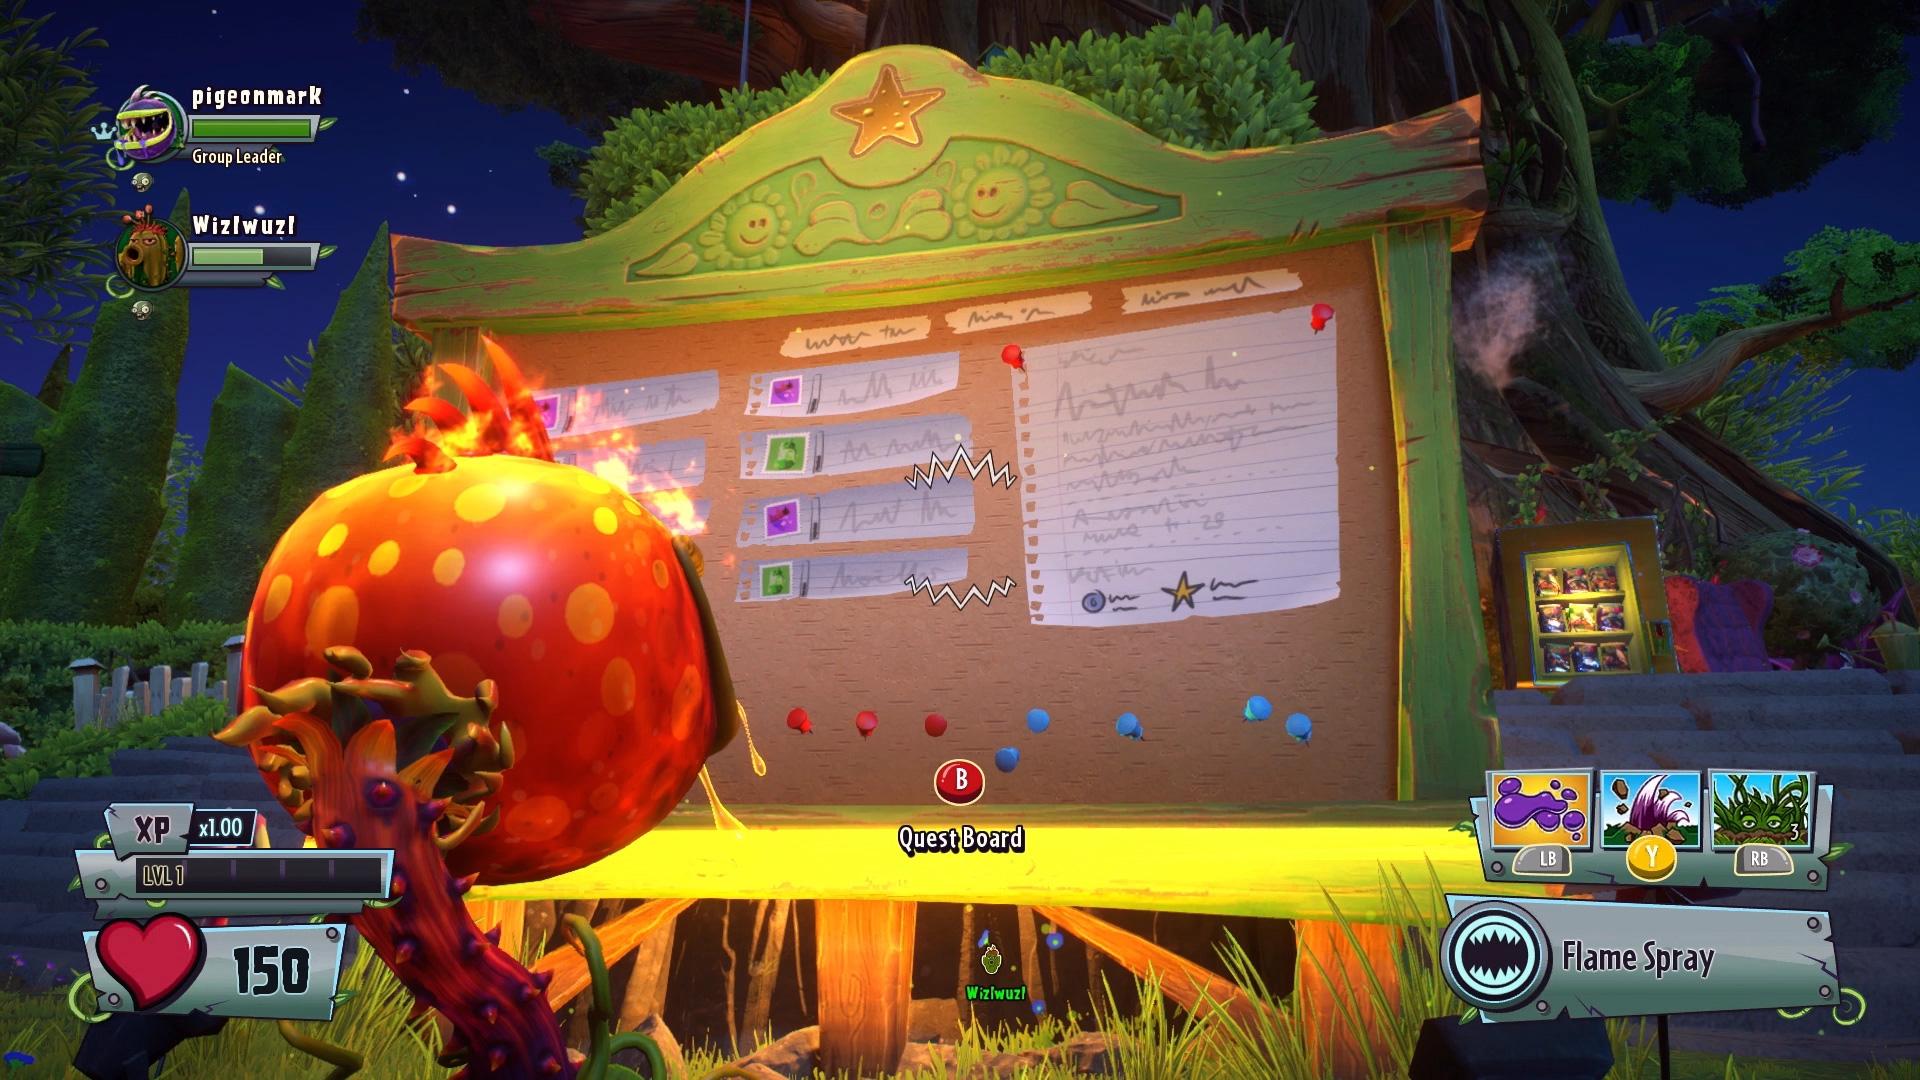 Xp And Progression In Plants Vs Zombies Garden Warfare 2